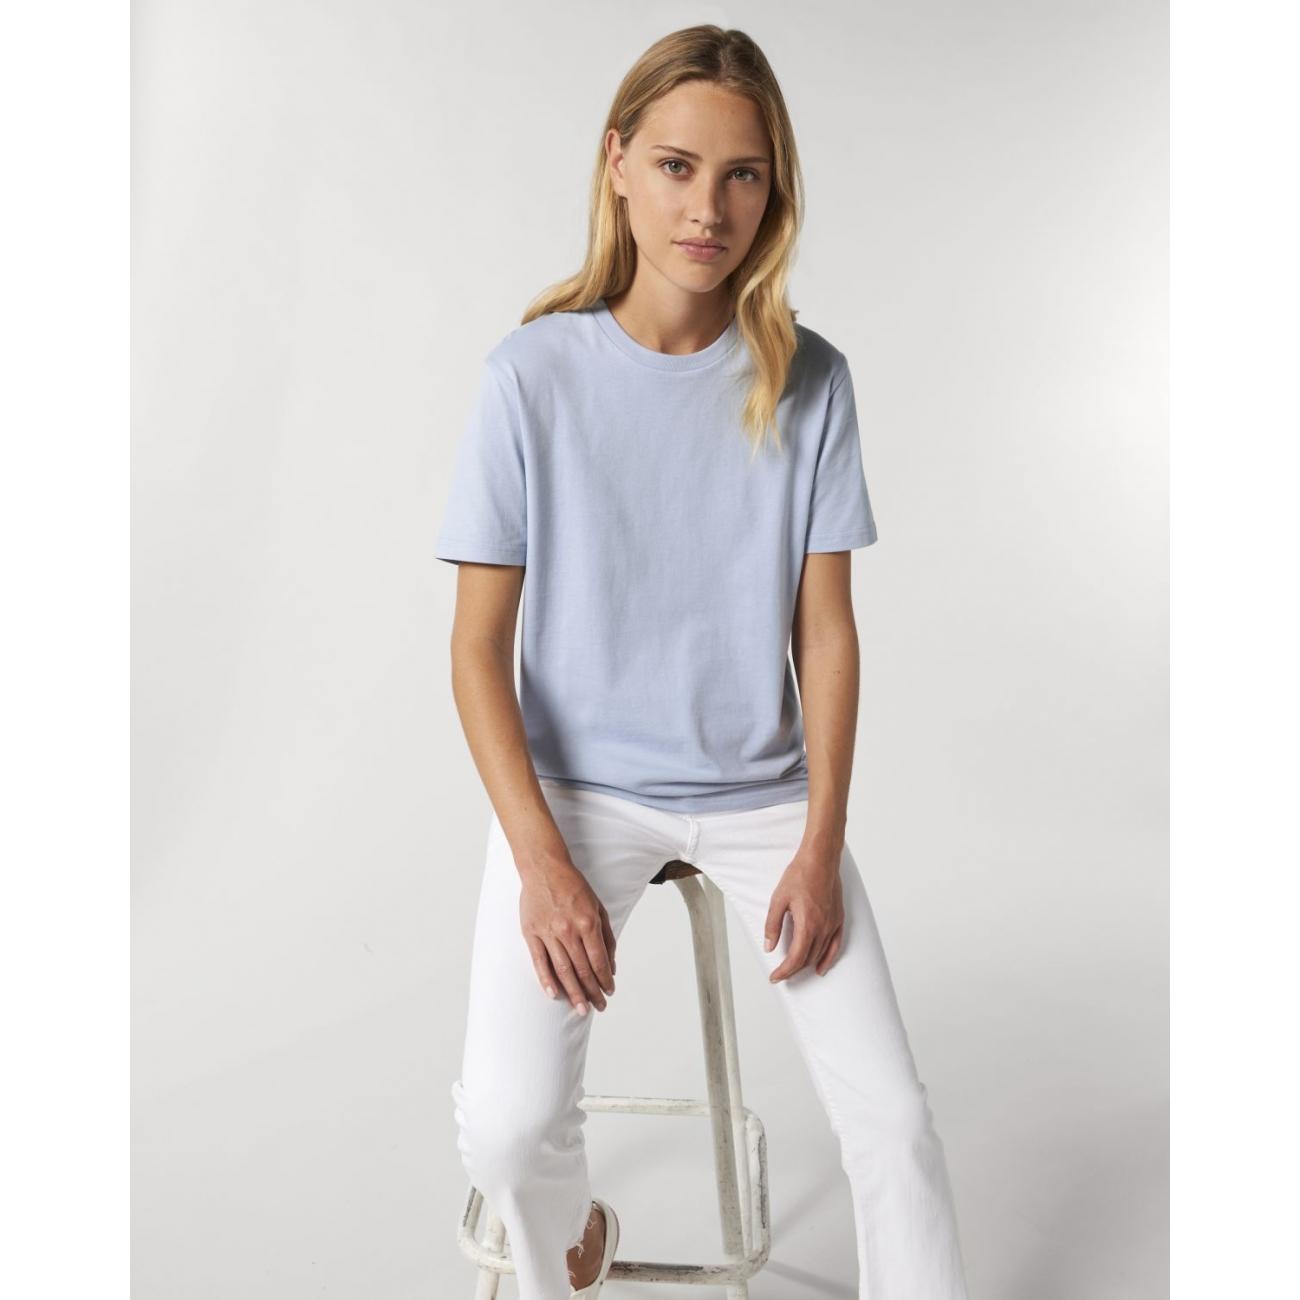 https://tee-shirt-bio.com/10682-thickbox_default/tee-shirt-femme-coton-bio-col-rond-coupe-classique-bleu-lavande.jpg